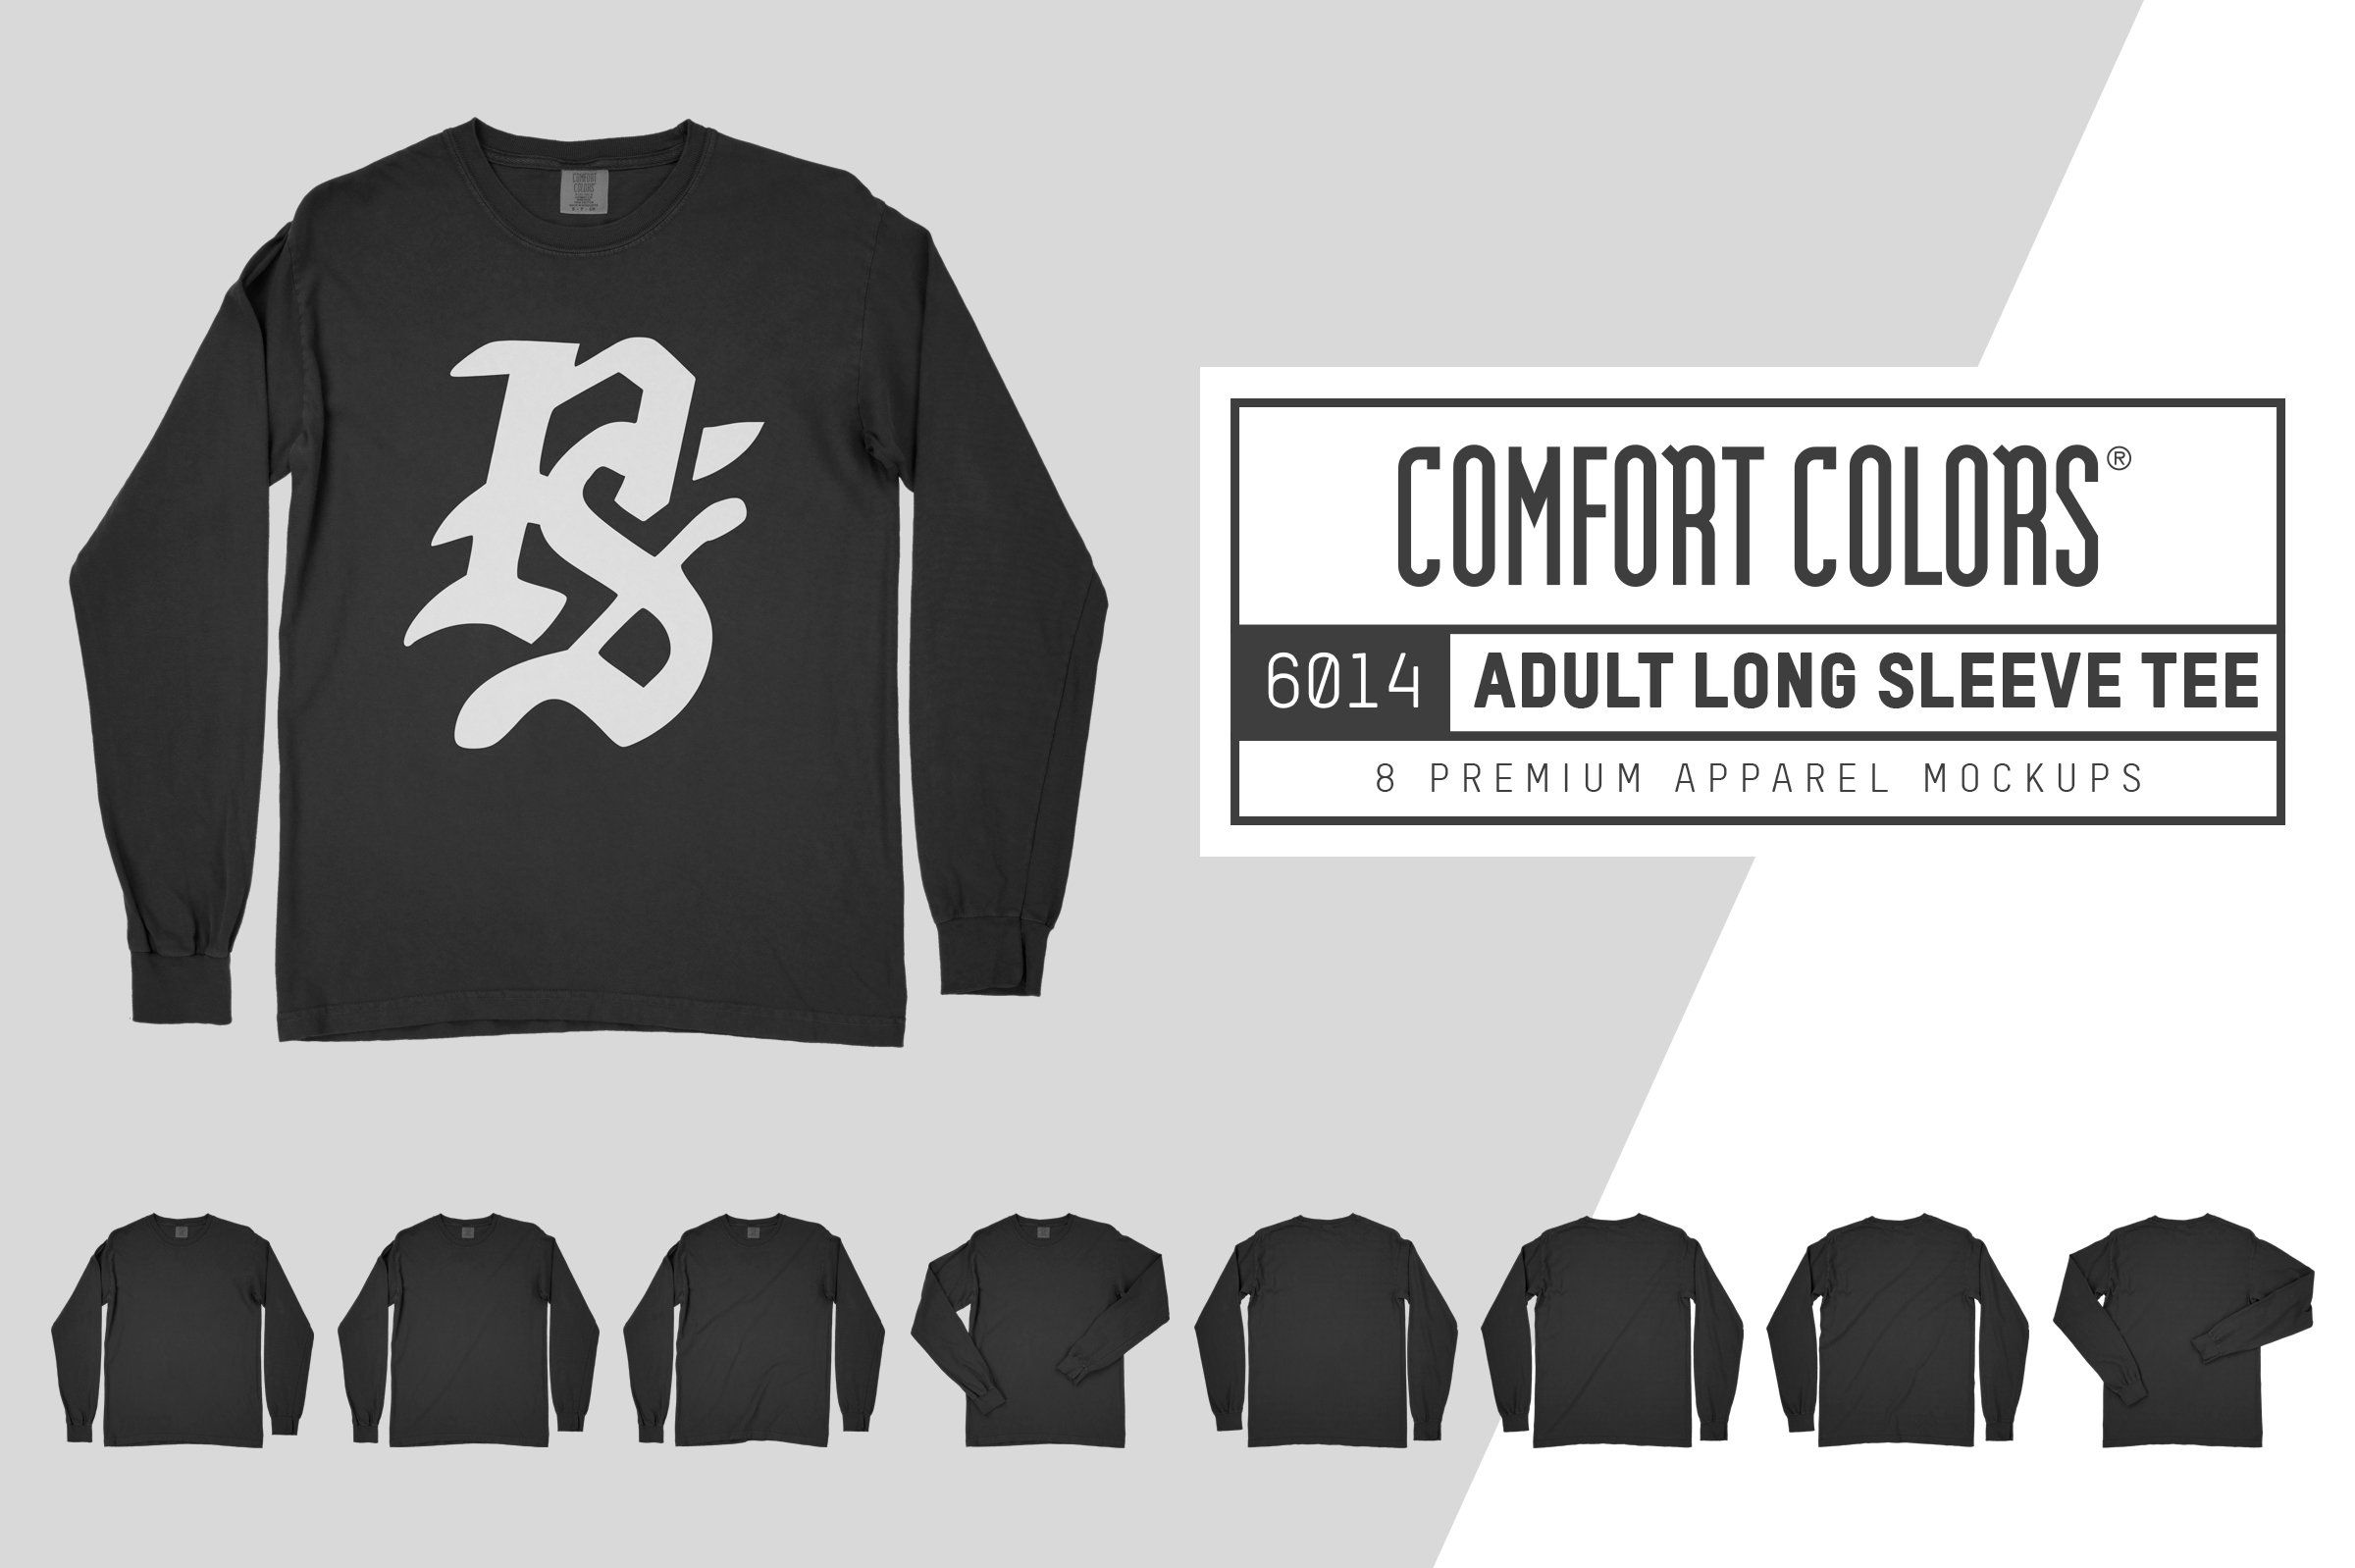 Comfort Colors 6014 Long Sleeve Tee Comfort Colors Long Sleeve